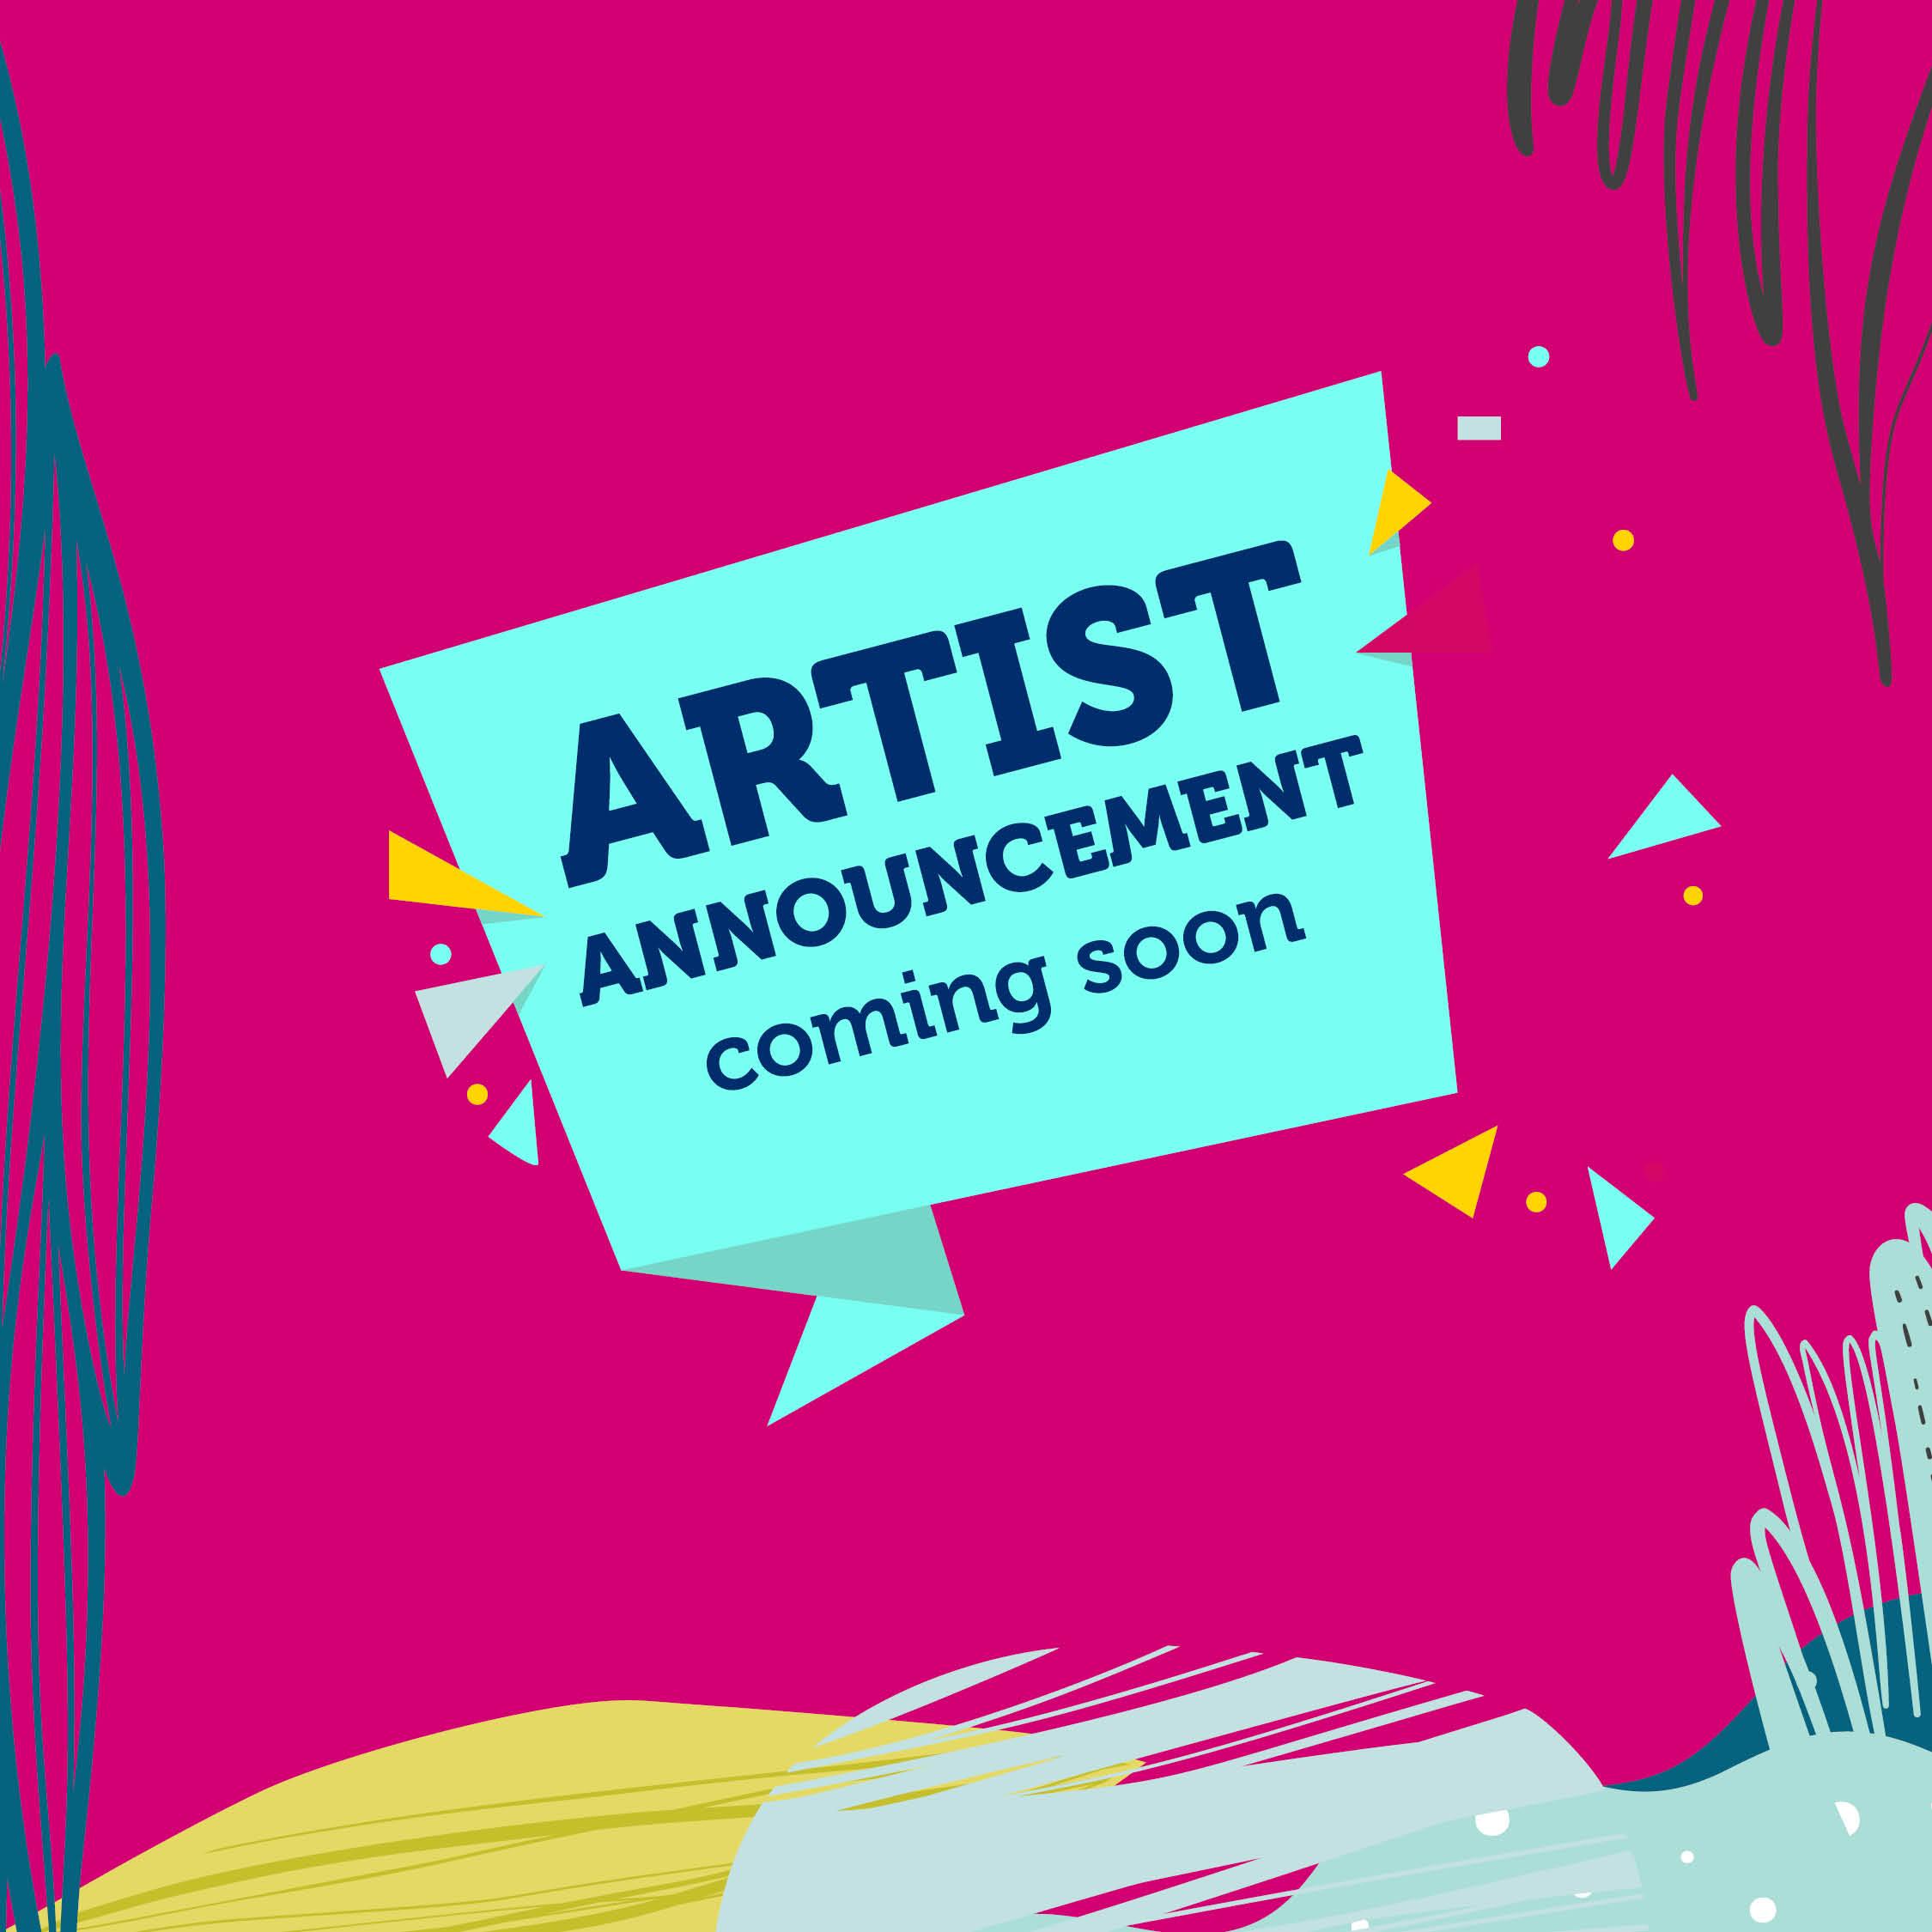 https://blovemusic.com/wp-content/uploads/2020/01/34352-BLOVE_Headline-announcement-coming-soon-web-images-Jan3.jpg